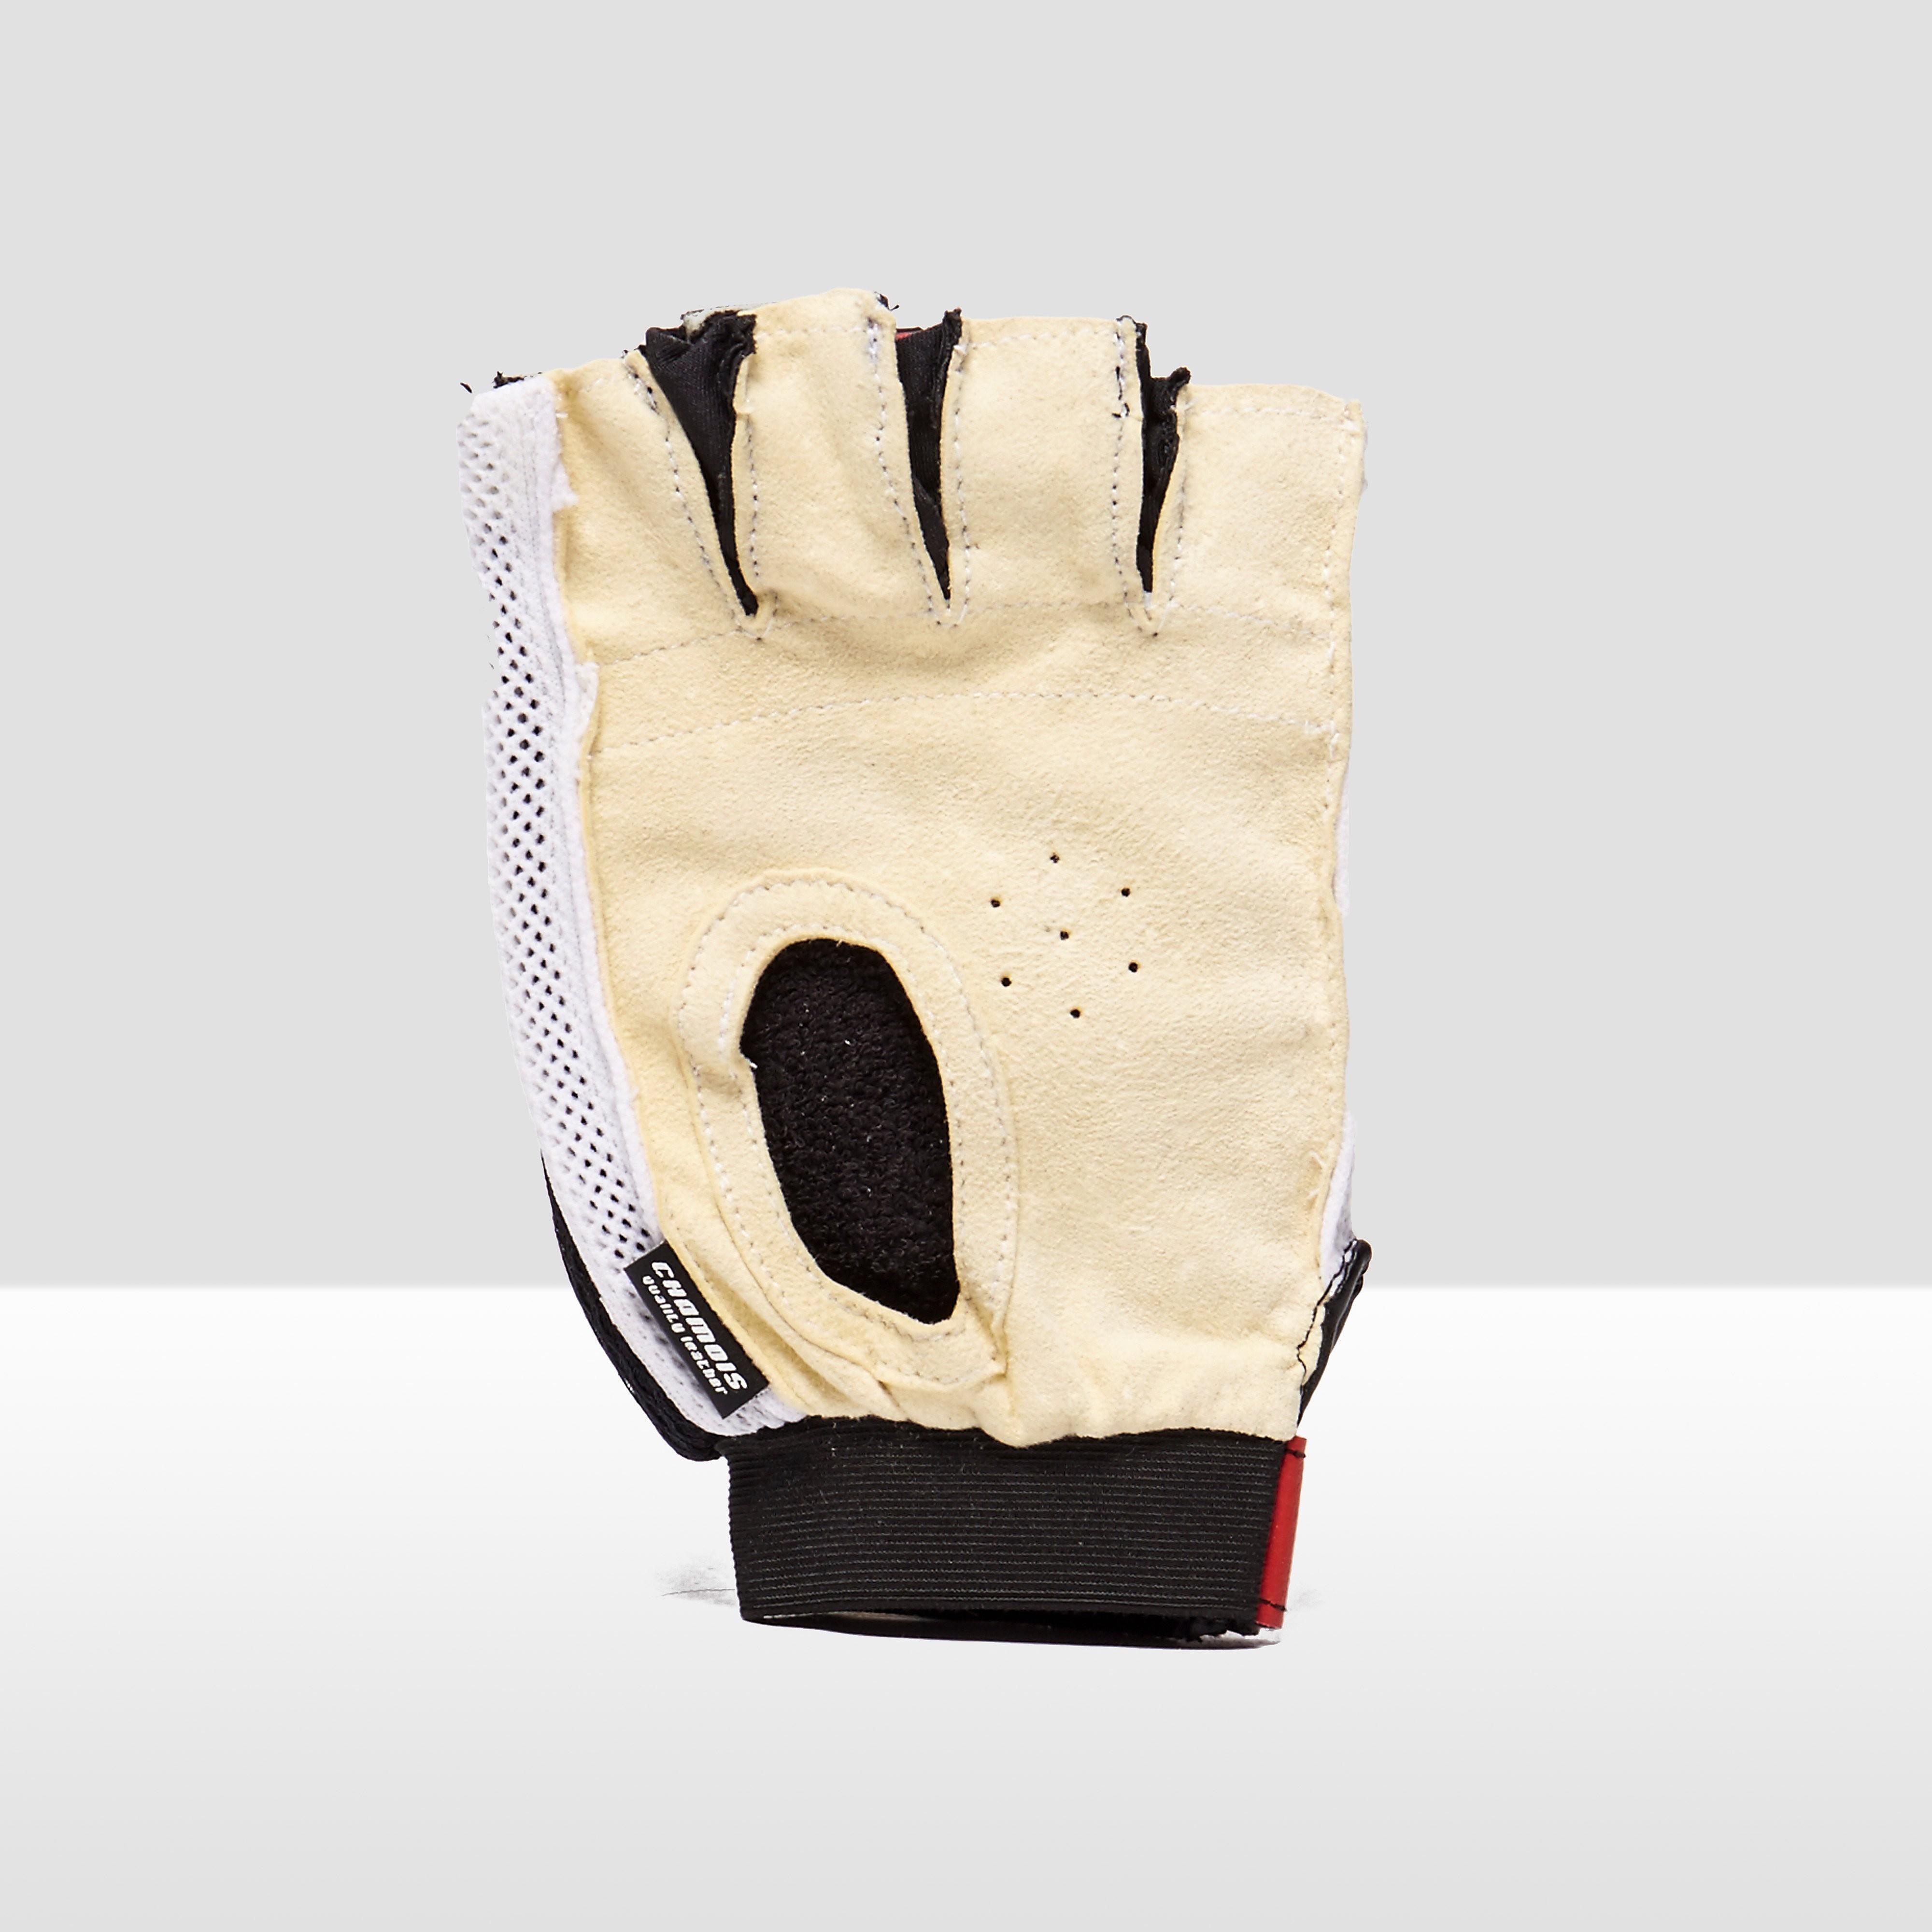 Kookaburra Venom Hand Guard